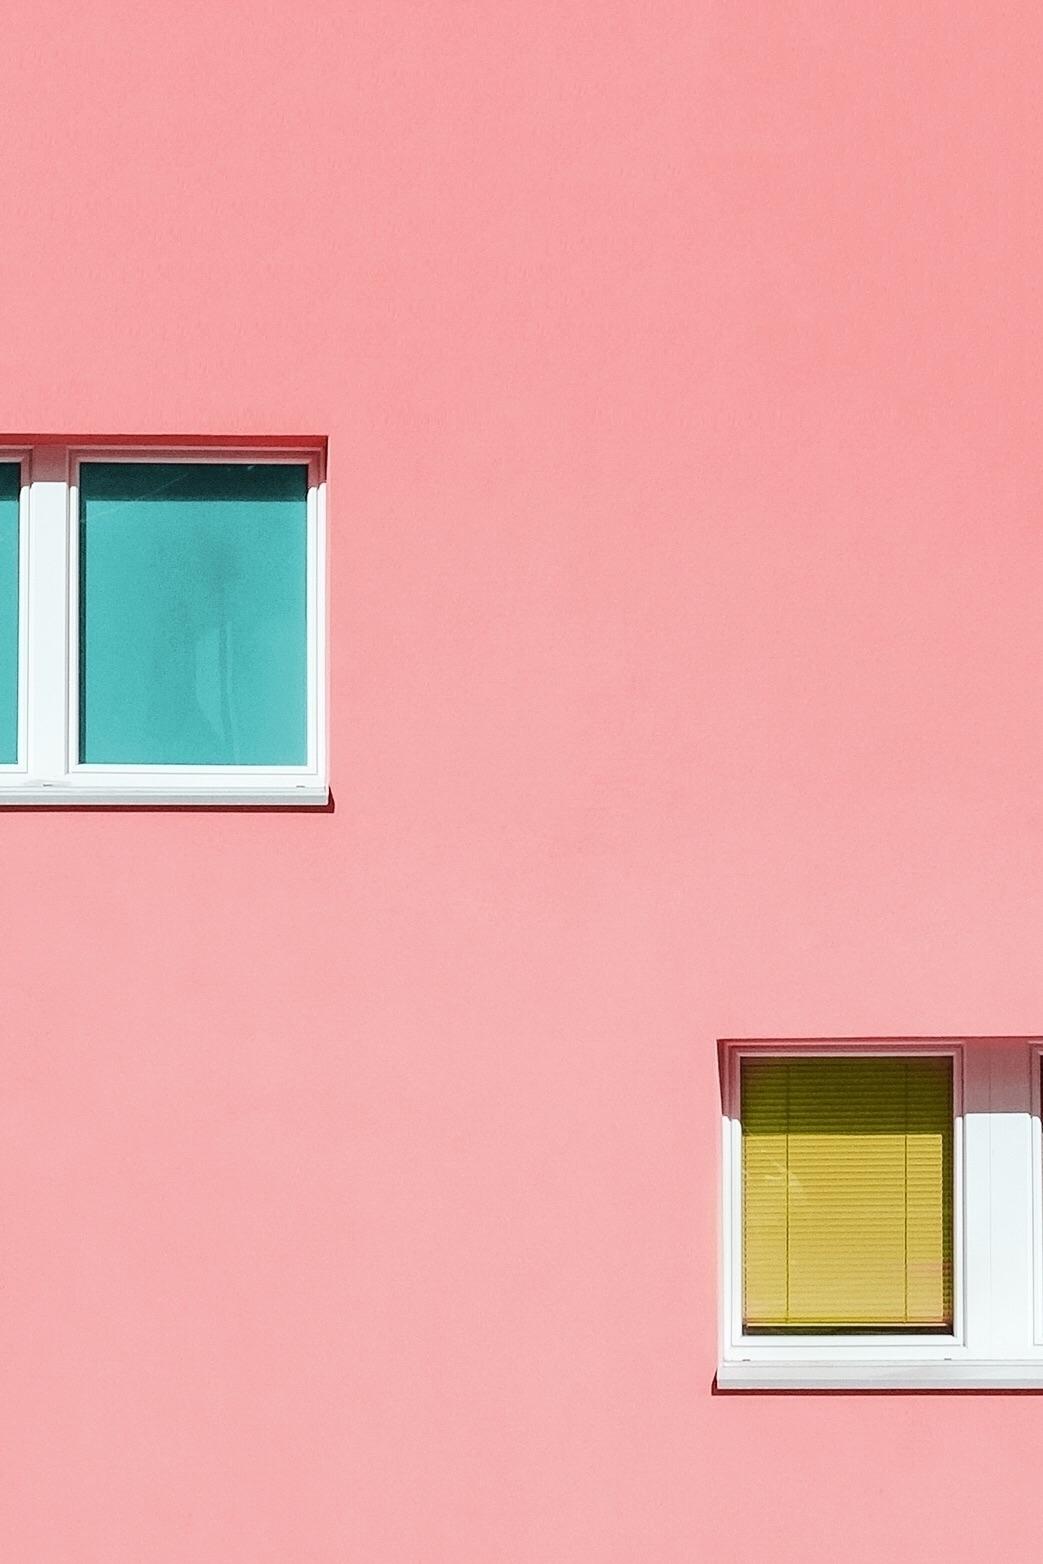 SWITZ - colorful, pink, fuji, yellow - codyguilfoyle | ello